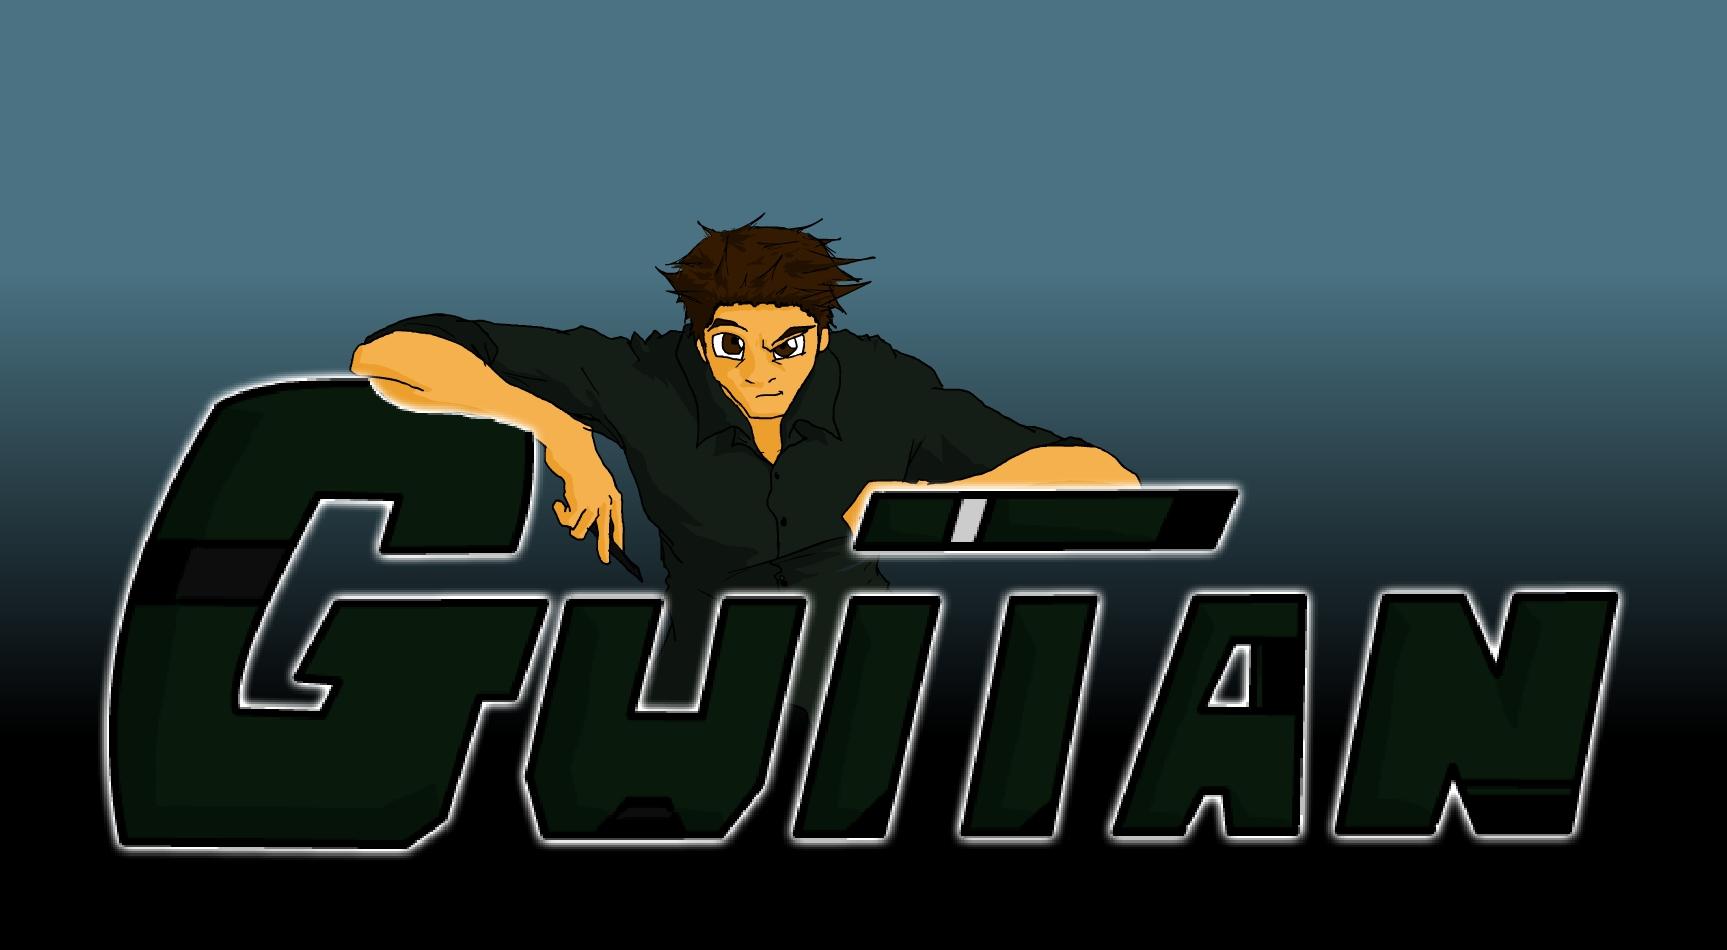 Guitan